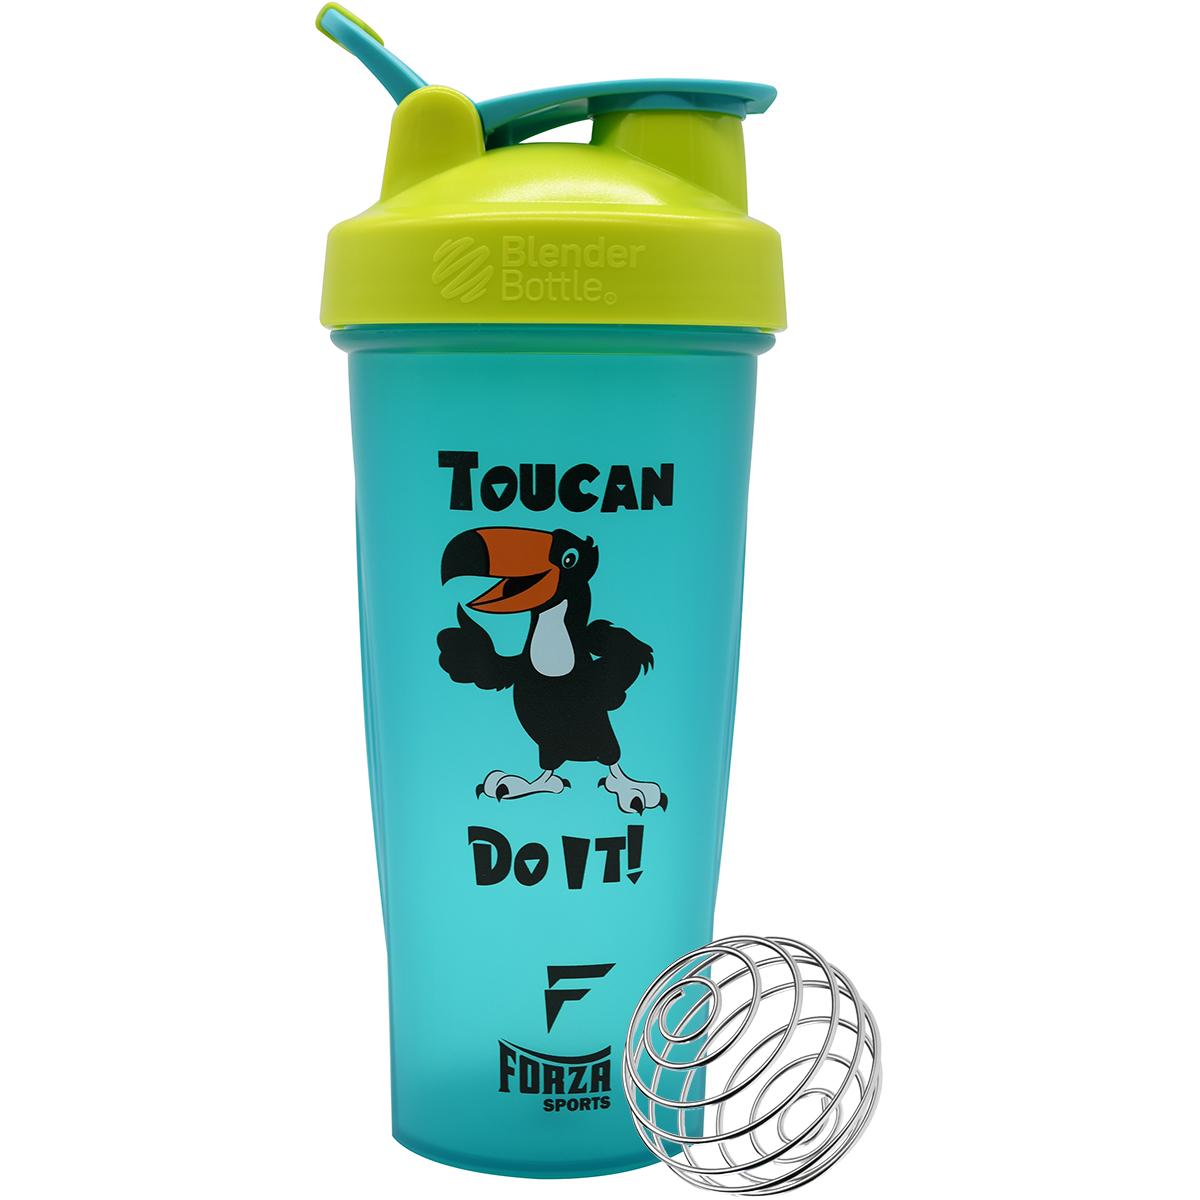 Toucan Do It! - Teal/Green